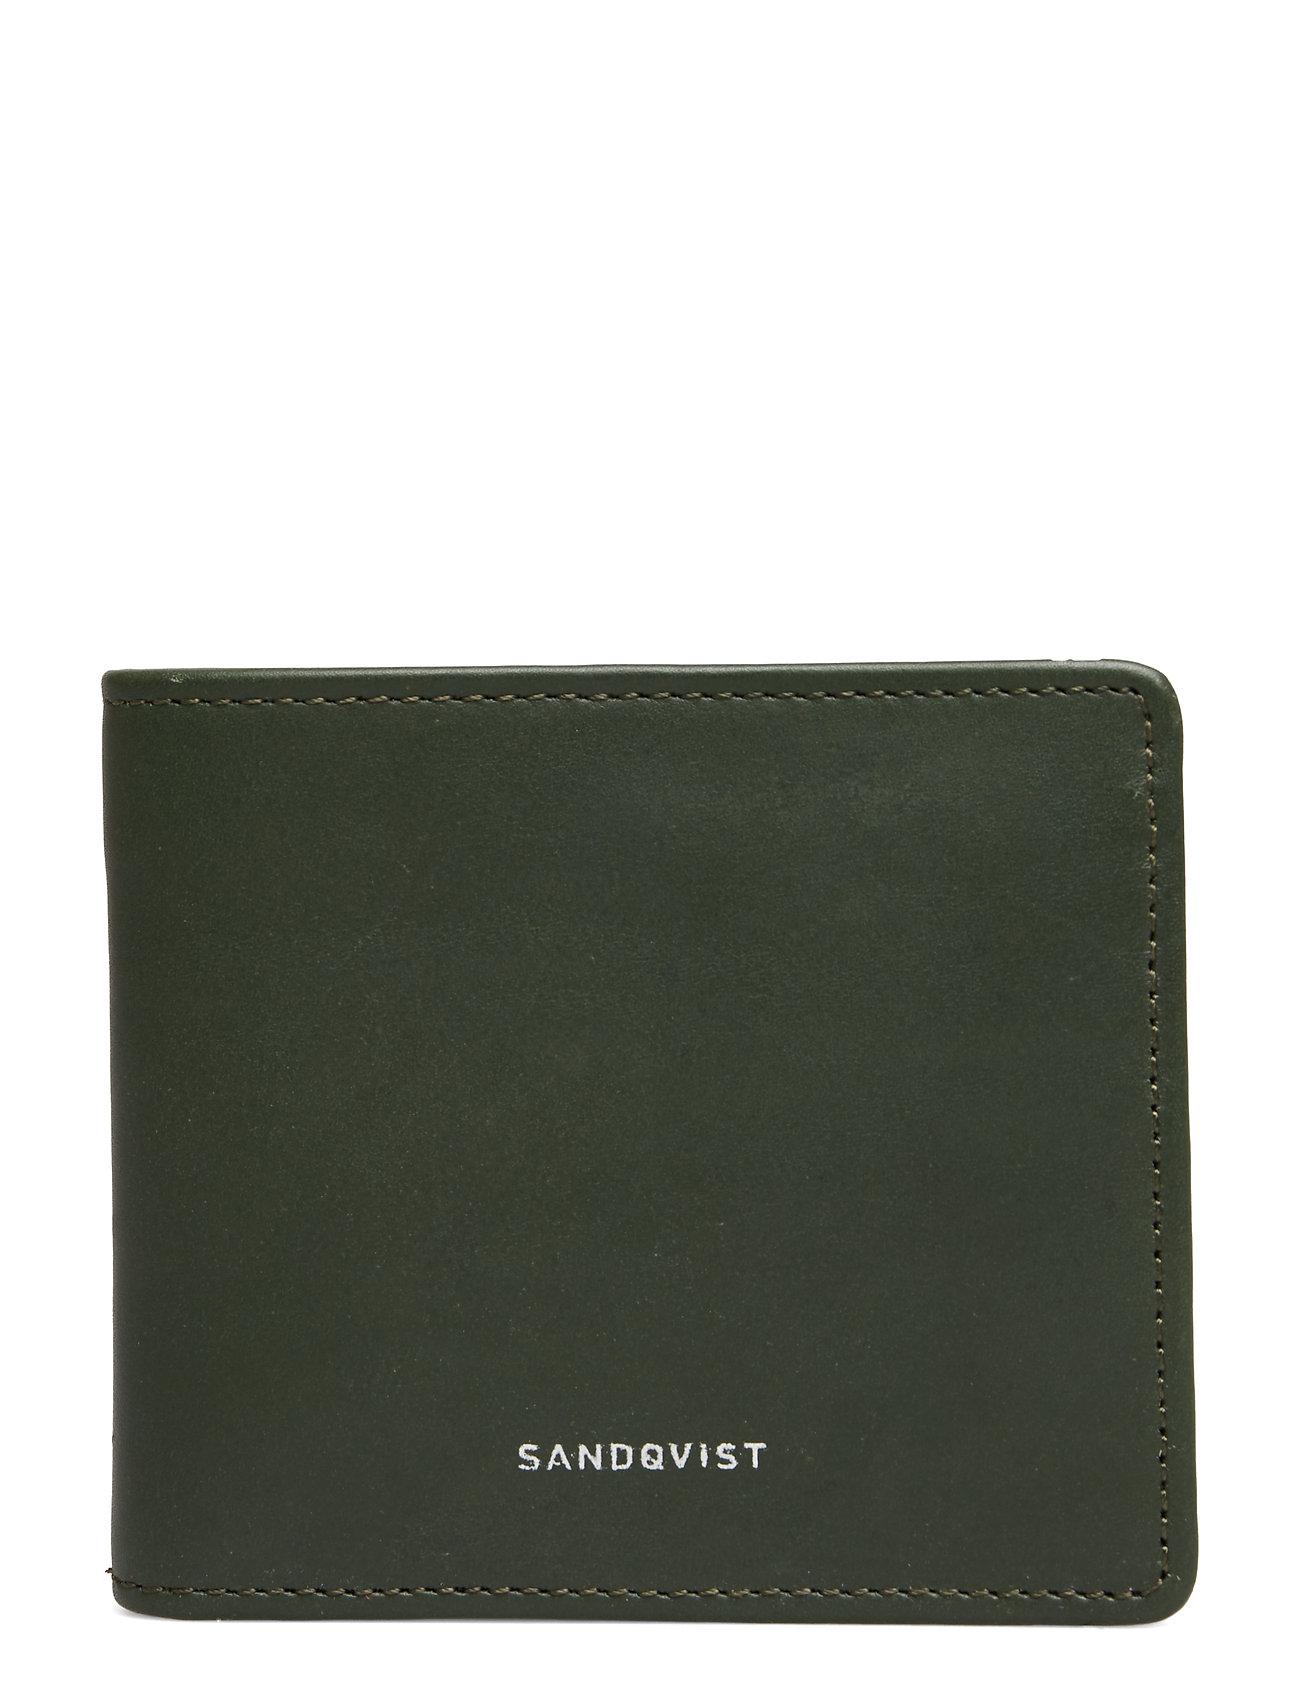 SANDQVIST MANFRED - GREEN